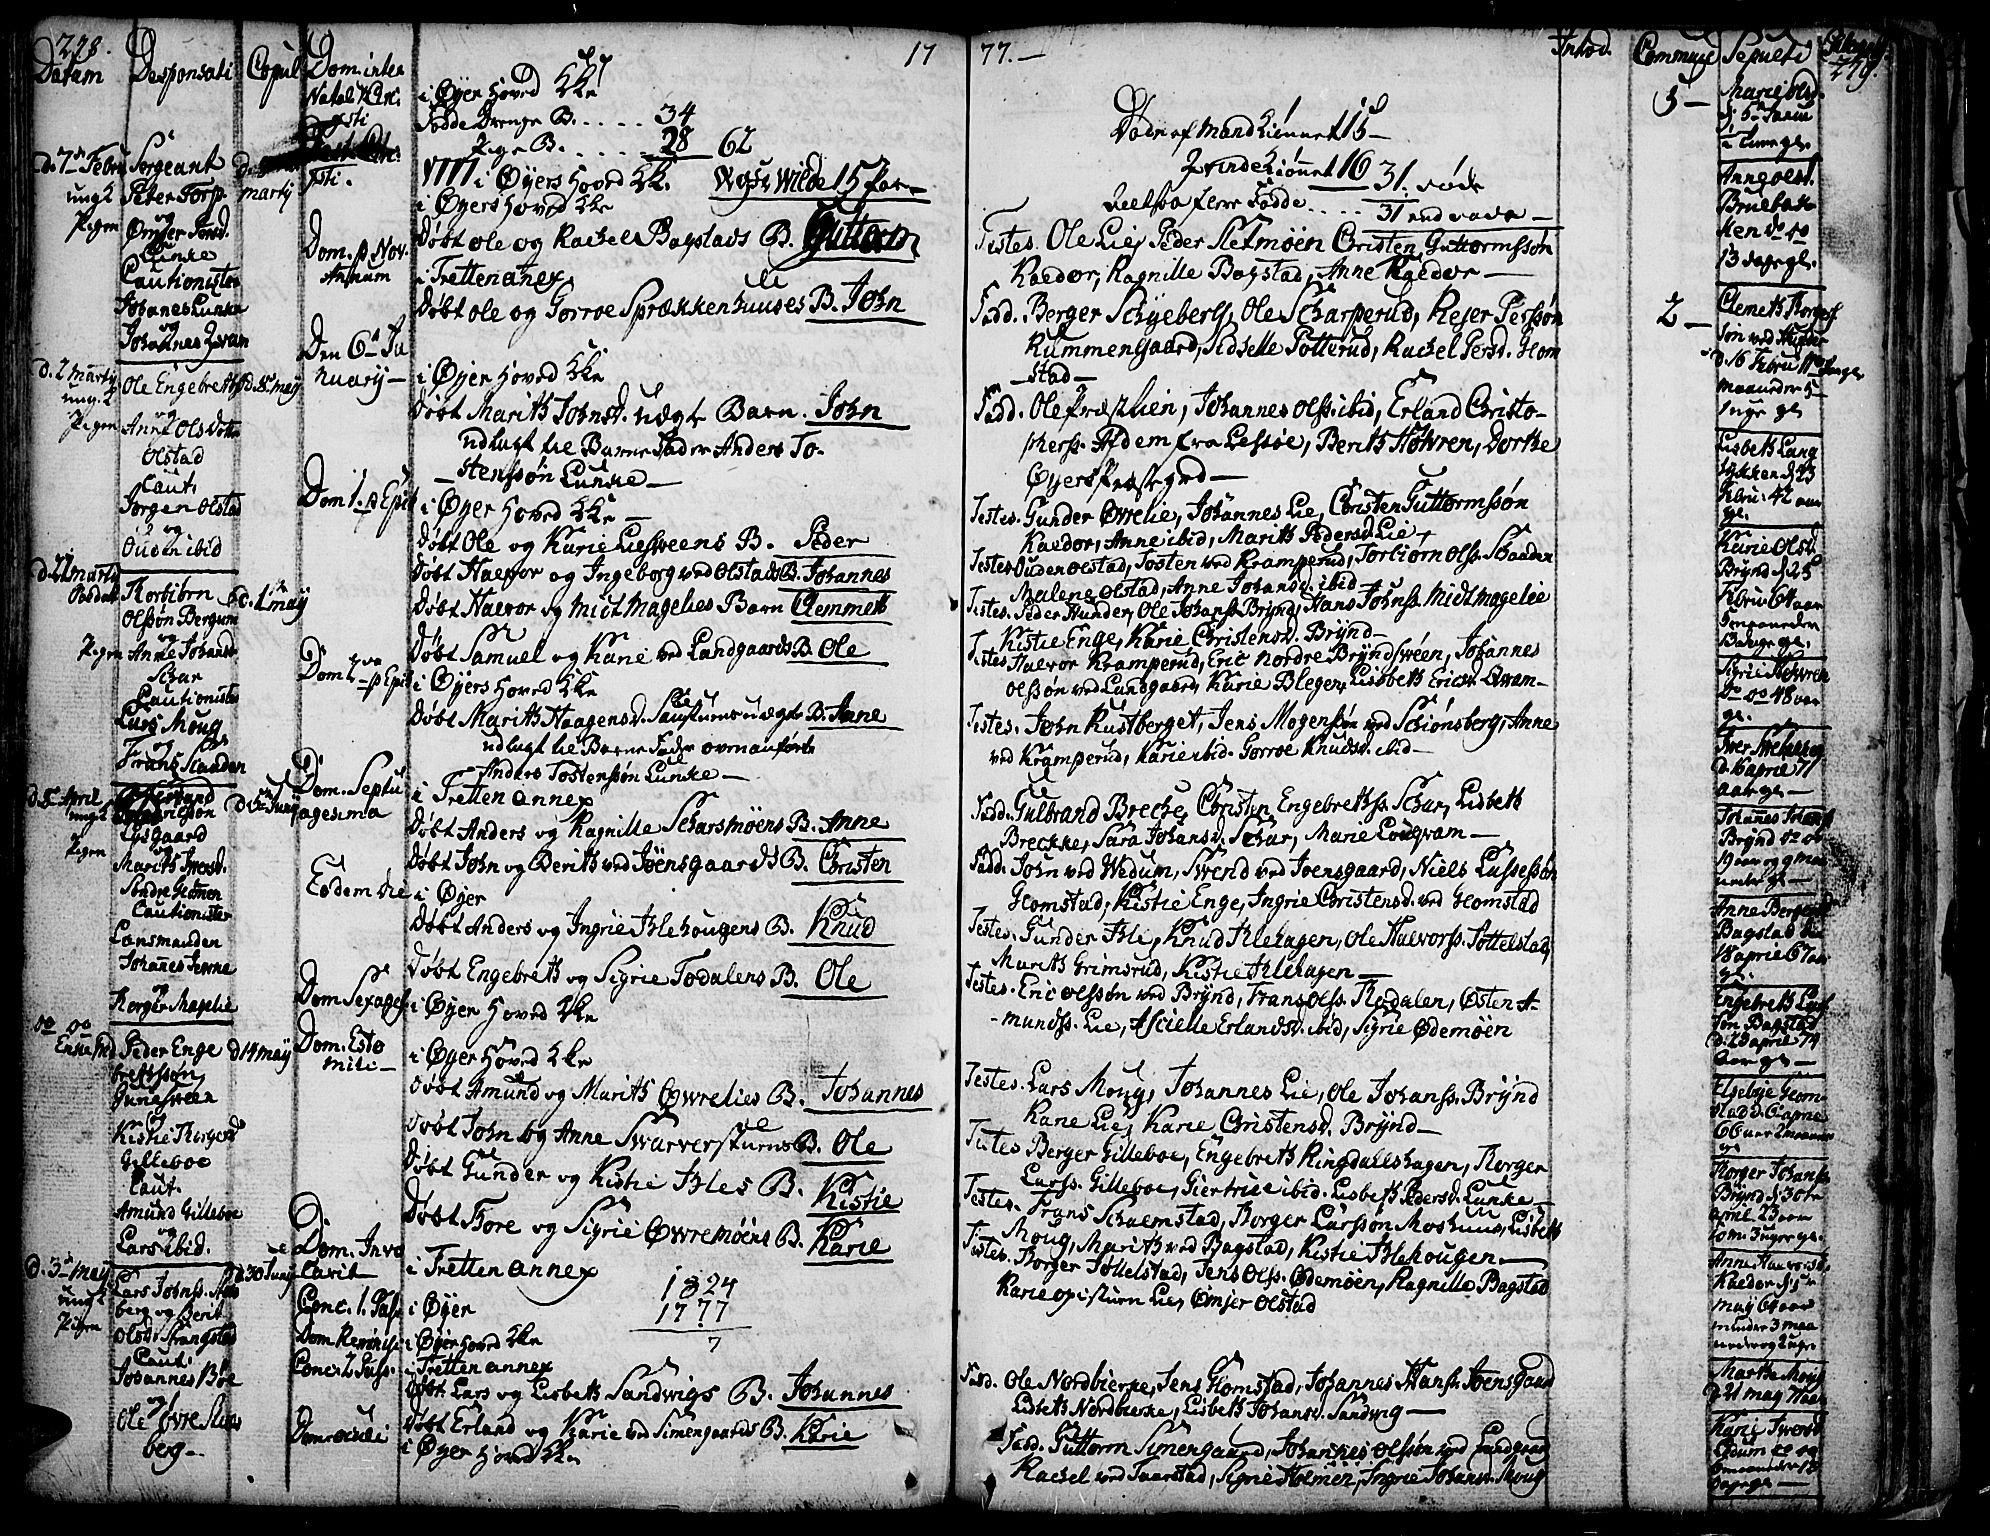 SAH, Øyer prestekontor, Ministerialbok nr. 2, 1733-1784, s. 278-279